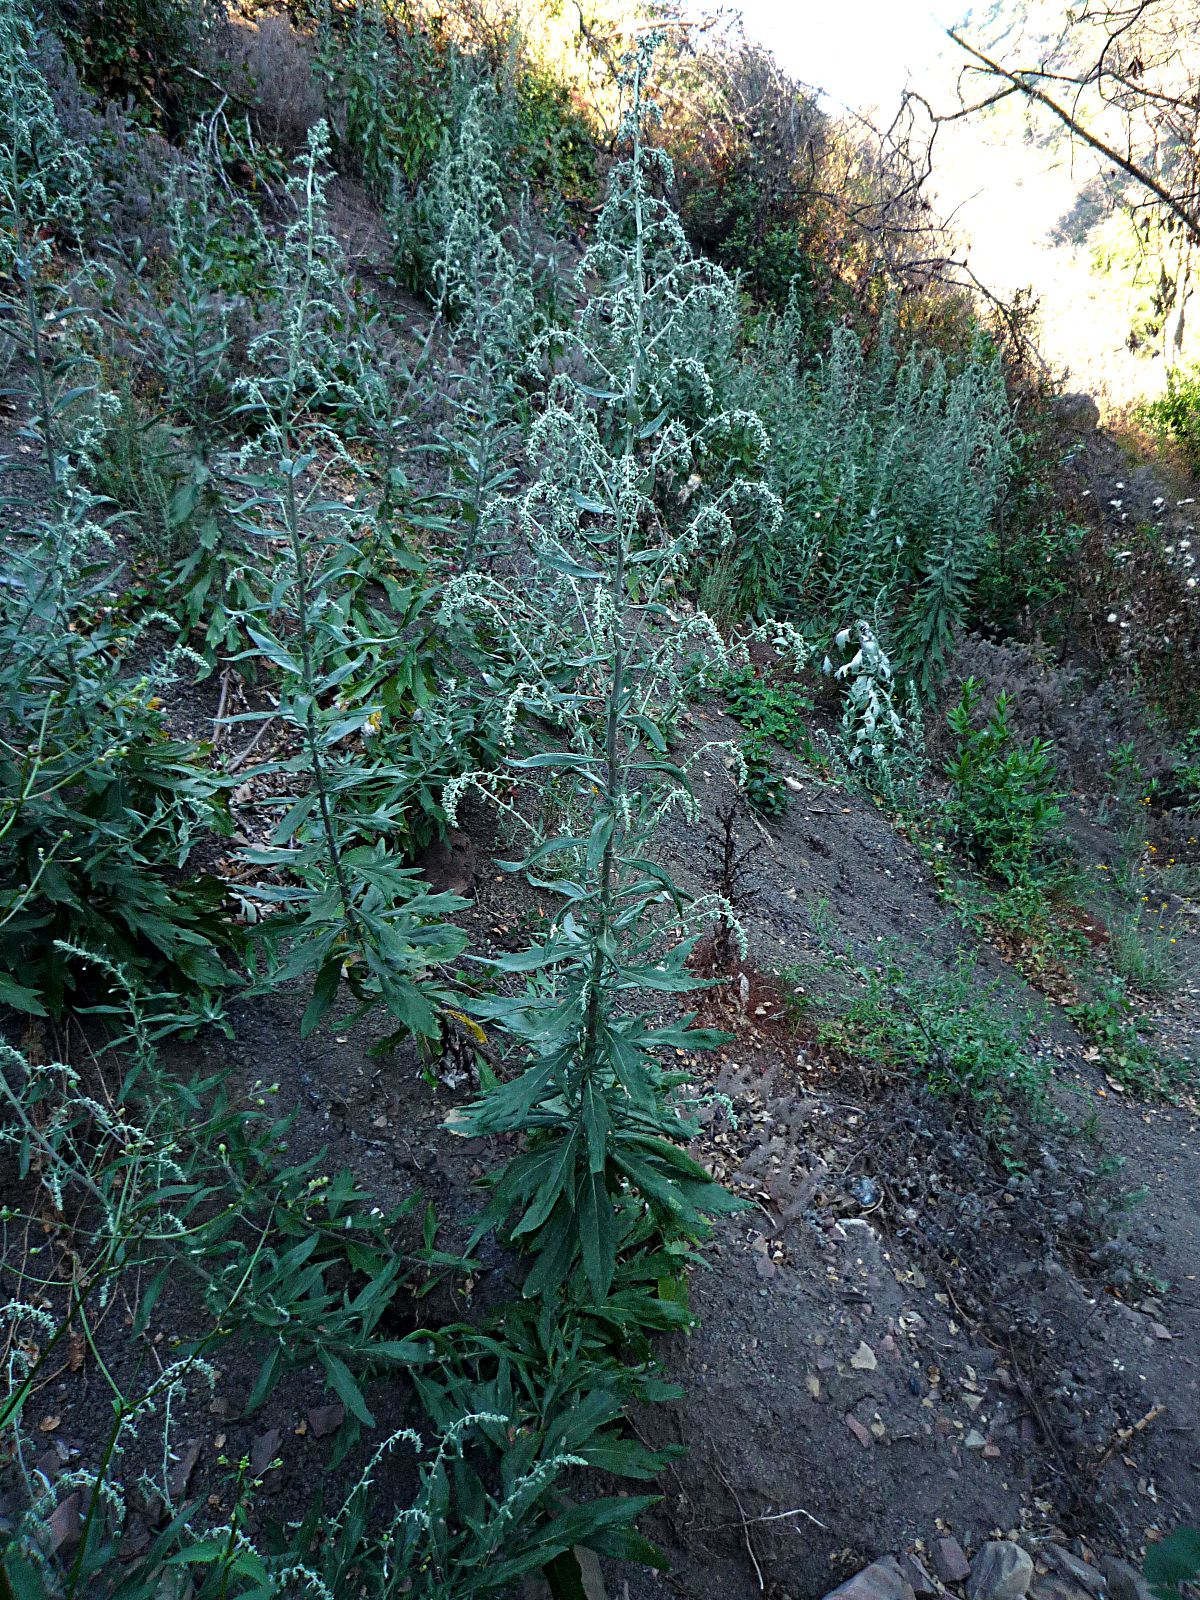 https://sbwildflowers.files.wordpress.com/2010/07/artemisia-douglasiana-plant.jpeg